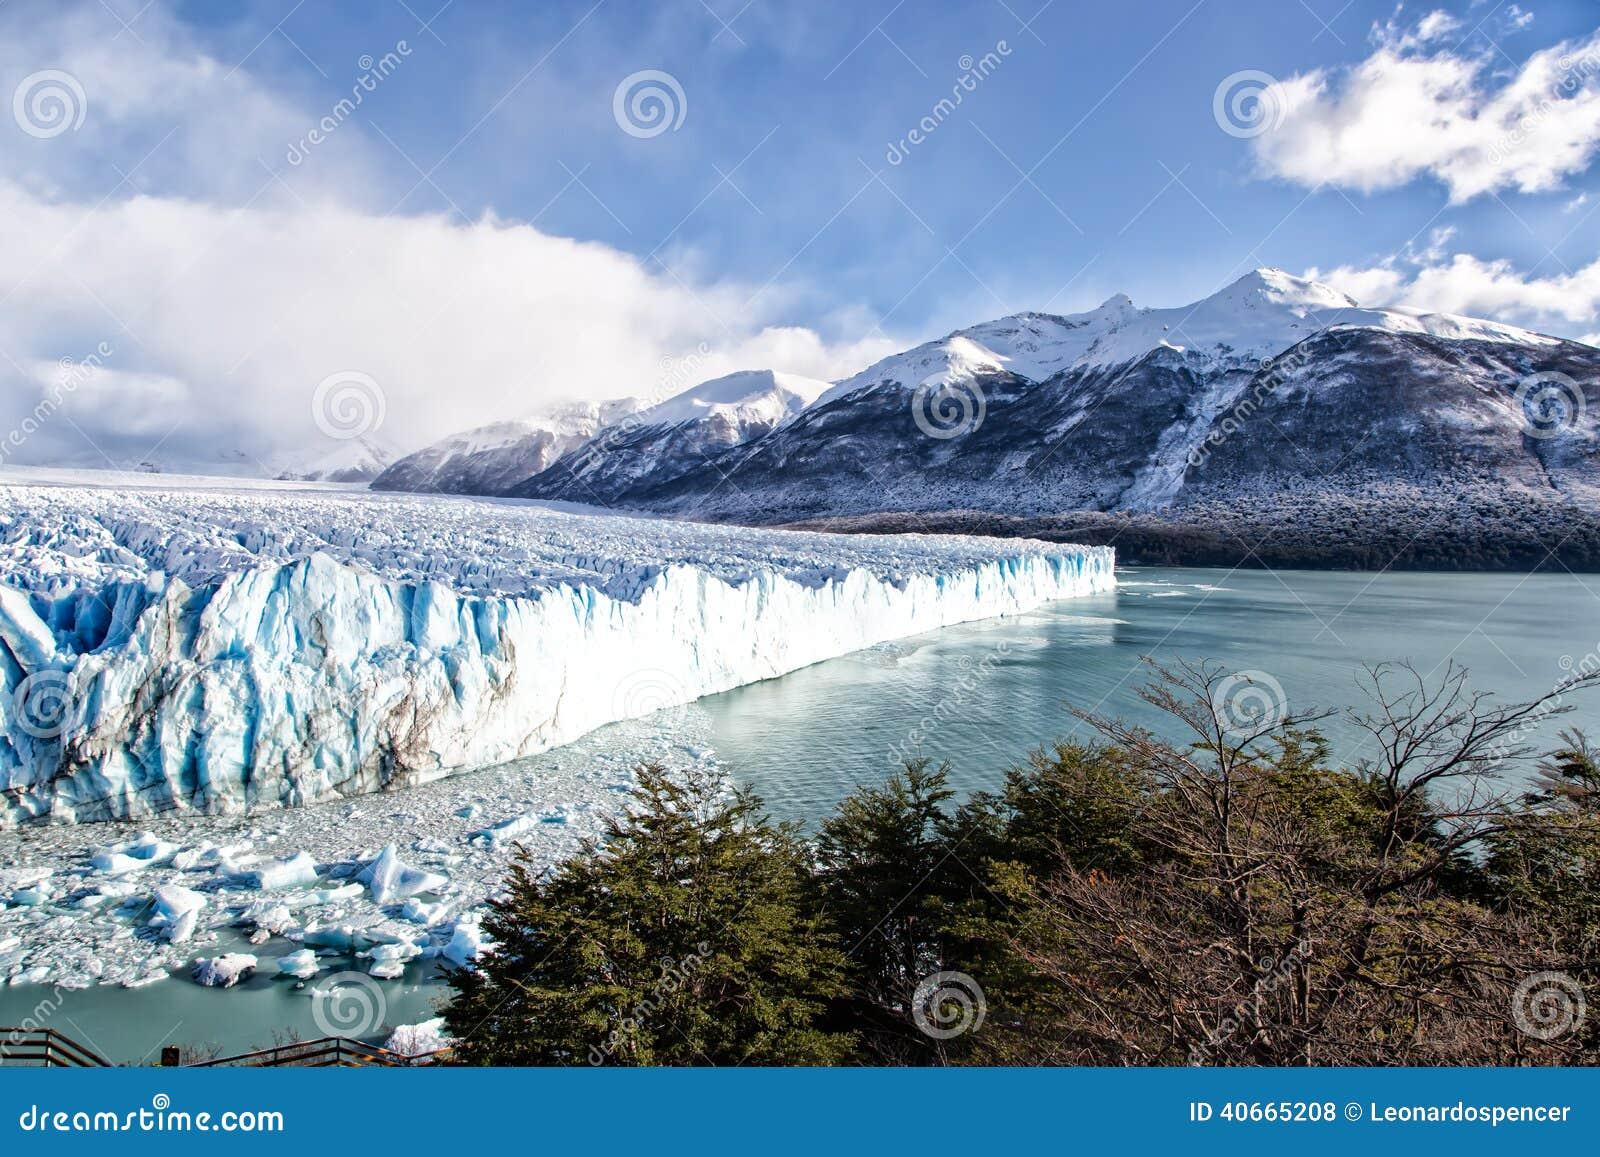 Patagonia South America >> Blue Ice In Perito Moreno Glacier, Argentino Lake, Patagonia, Argentina Stock Photo - Image ...